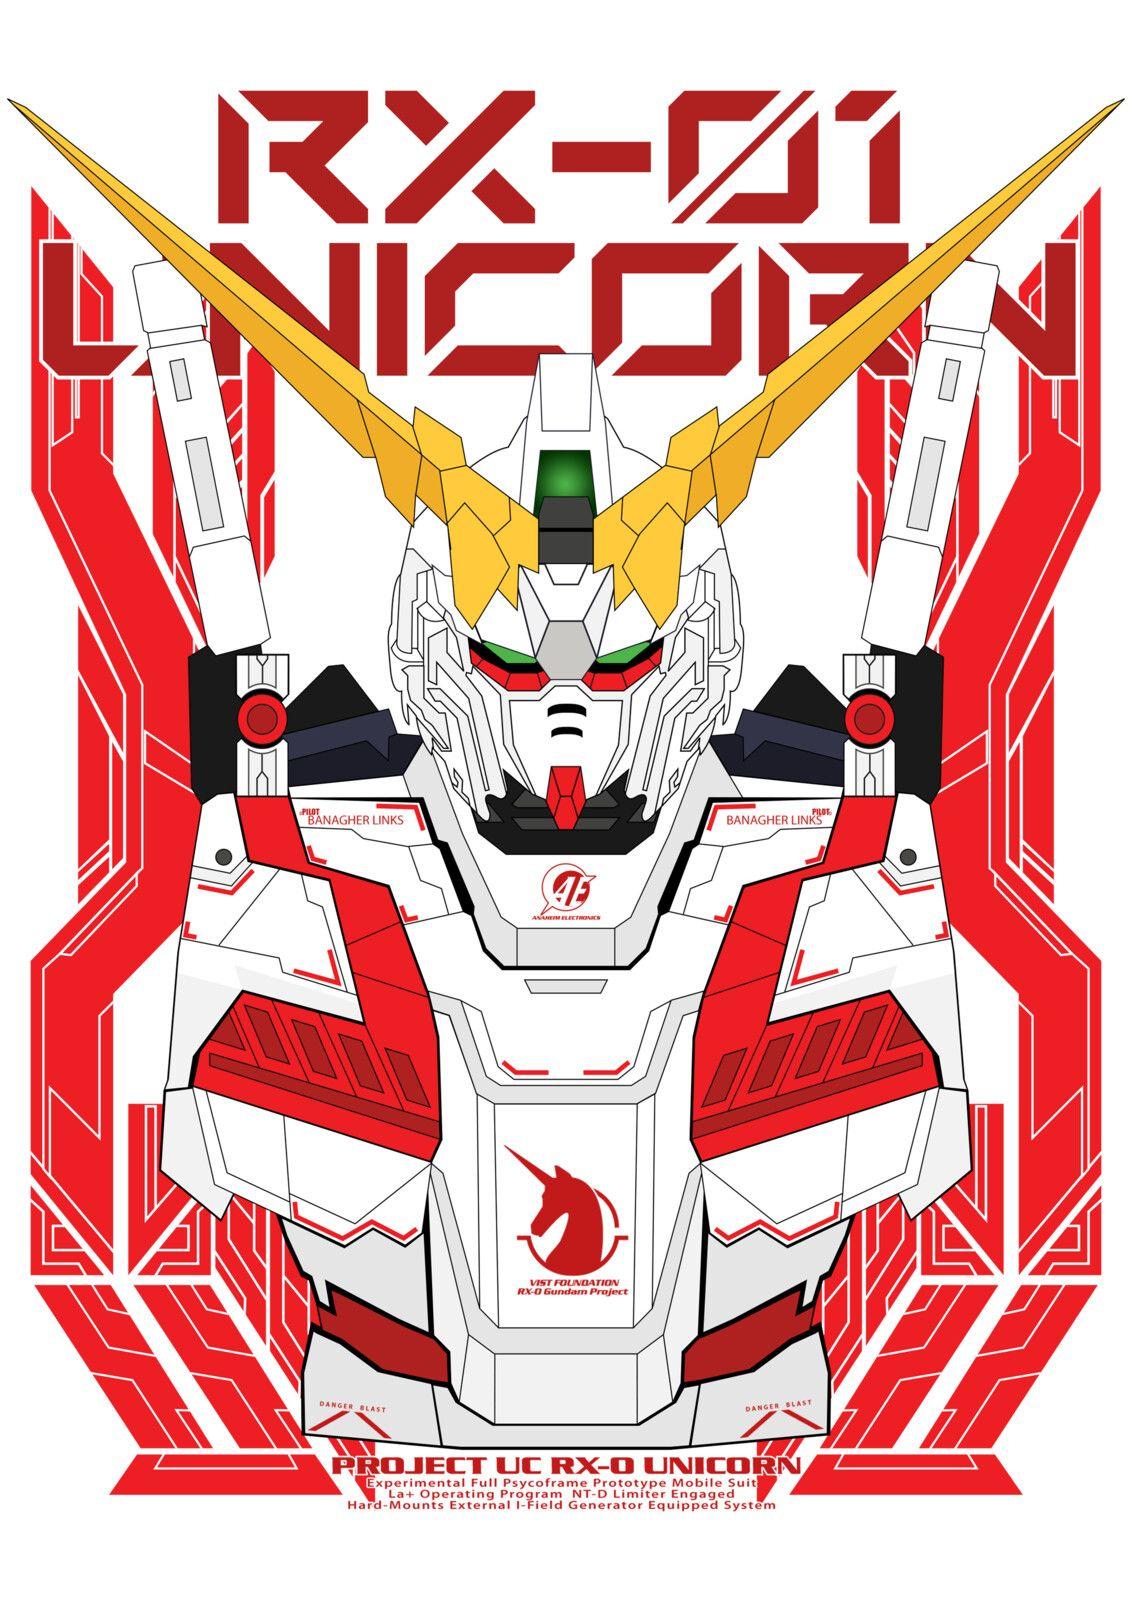 Gundam Unicorn Rx 01 Alfian Dwi On Artstation At Www Artstation Com Artwork Vdx4wn In Gundam Wallpapers Custom Gundam Unicorn Gundam